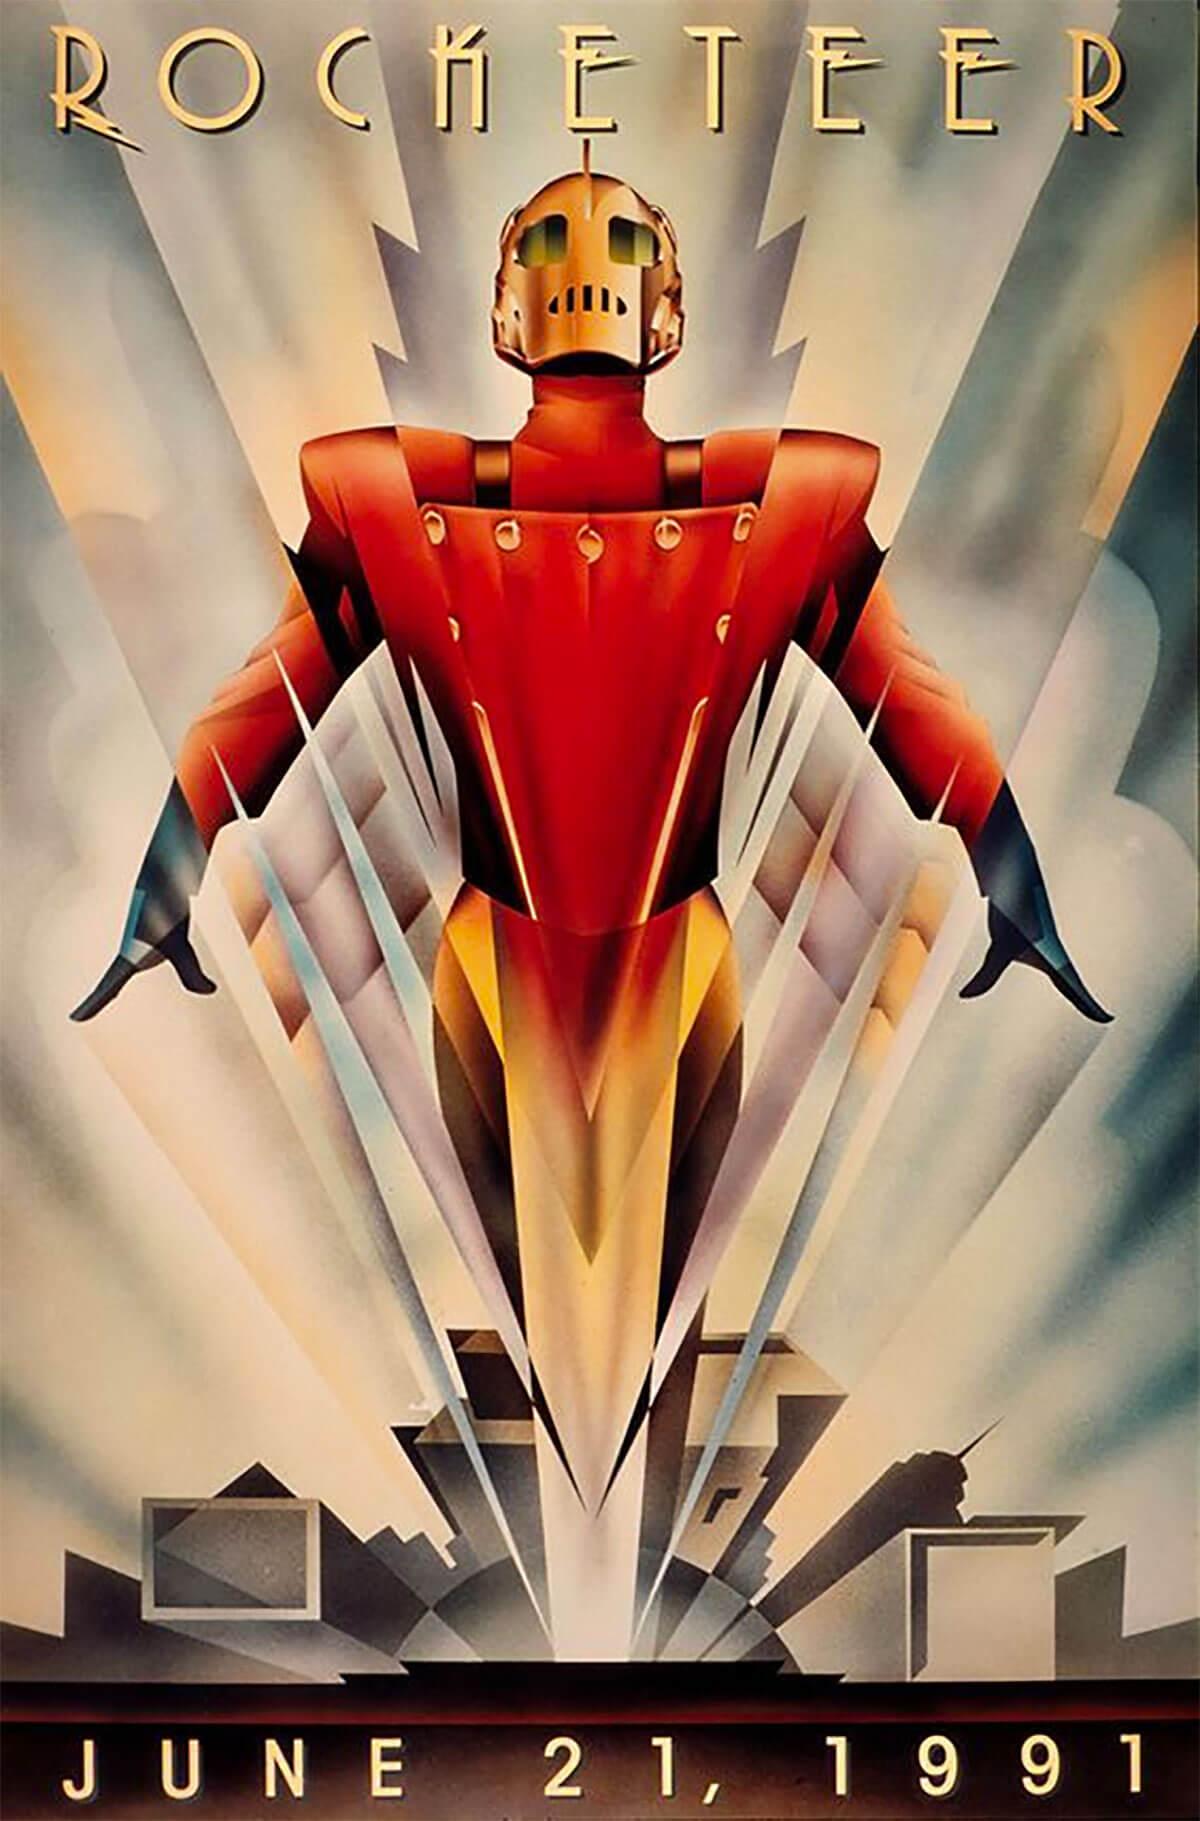 Rocketeer in Art Deco Style